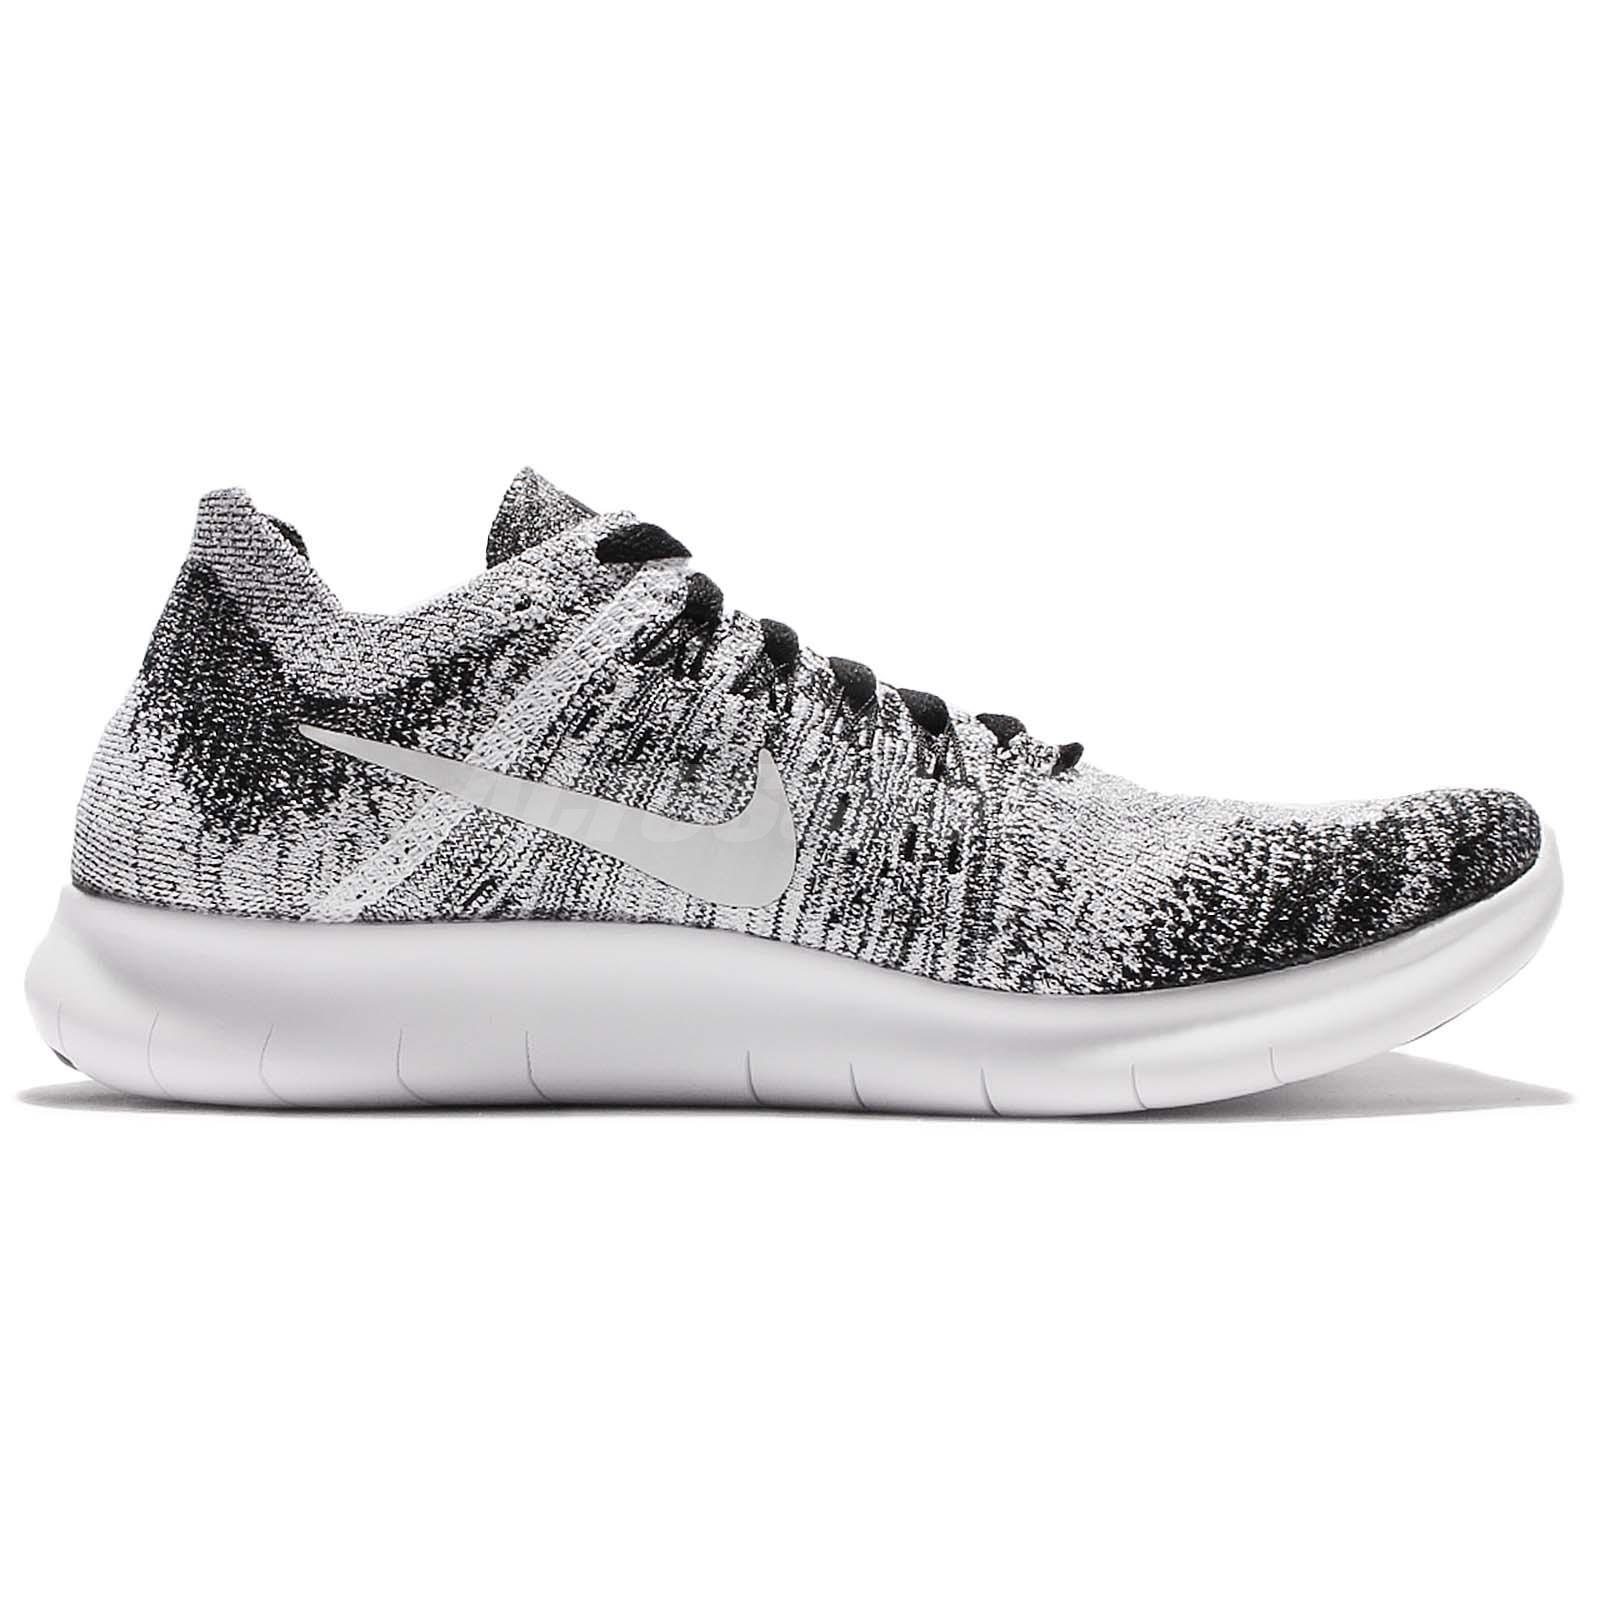 7418fd7b4fcb Kids Nike Flyknit Black And White Background Nike Free Trail